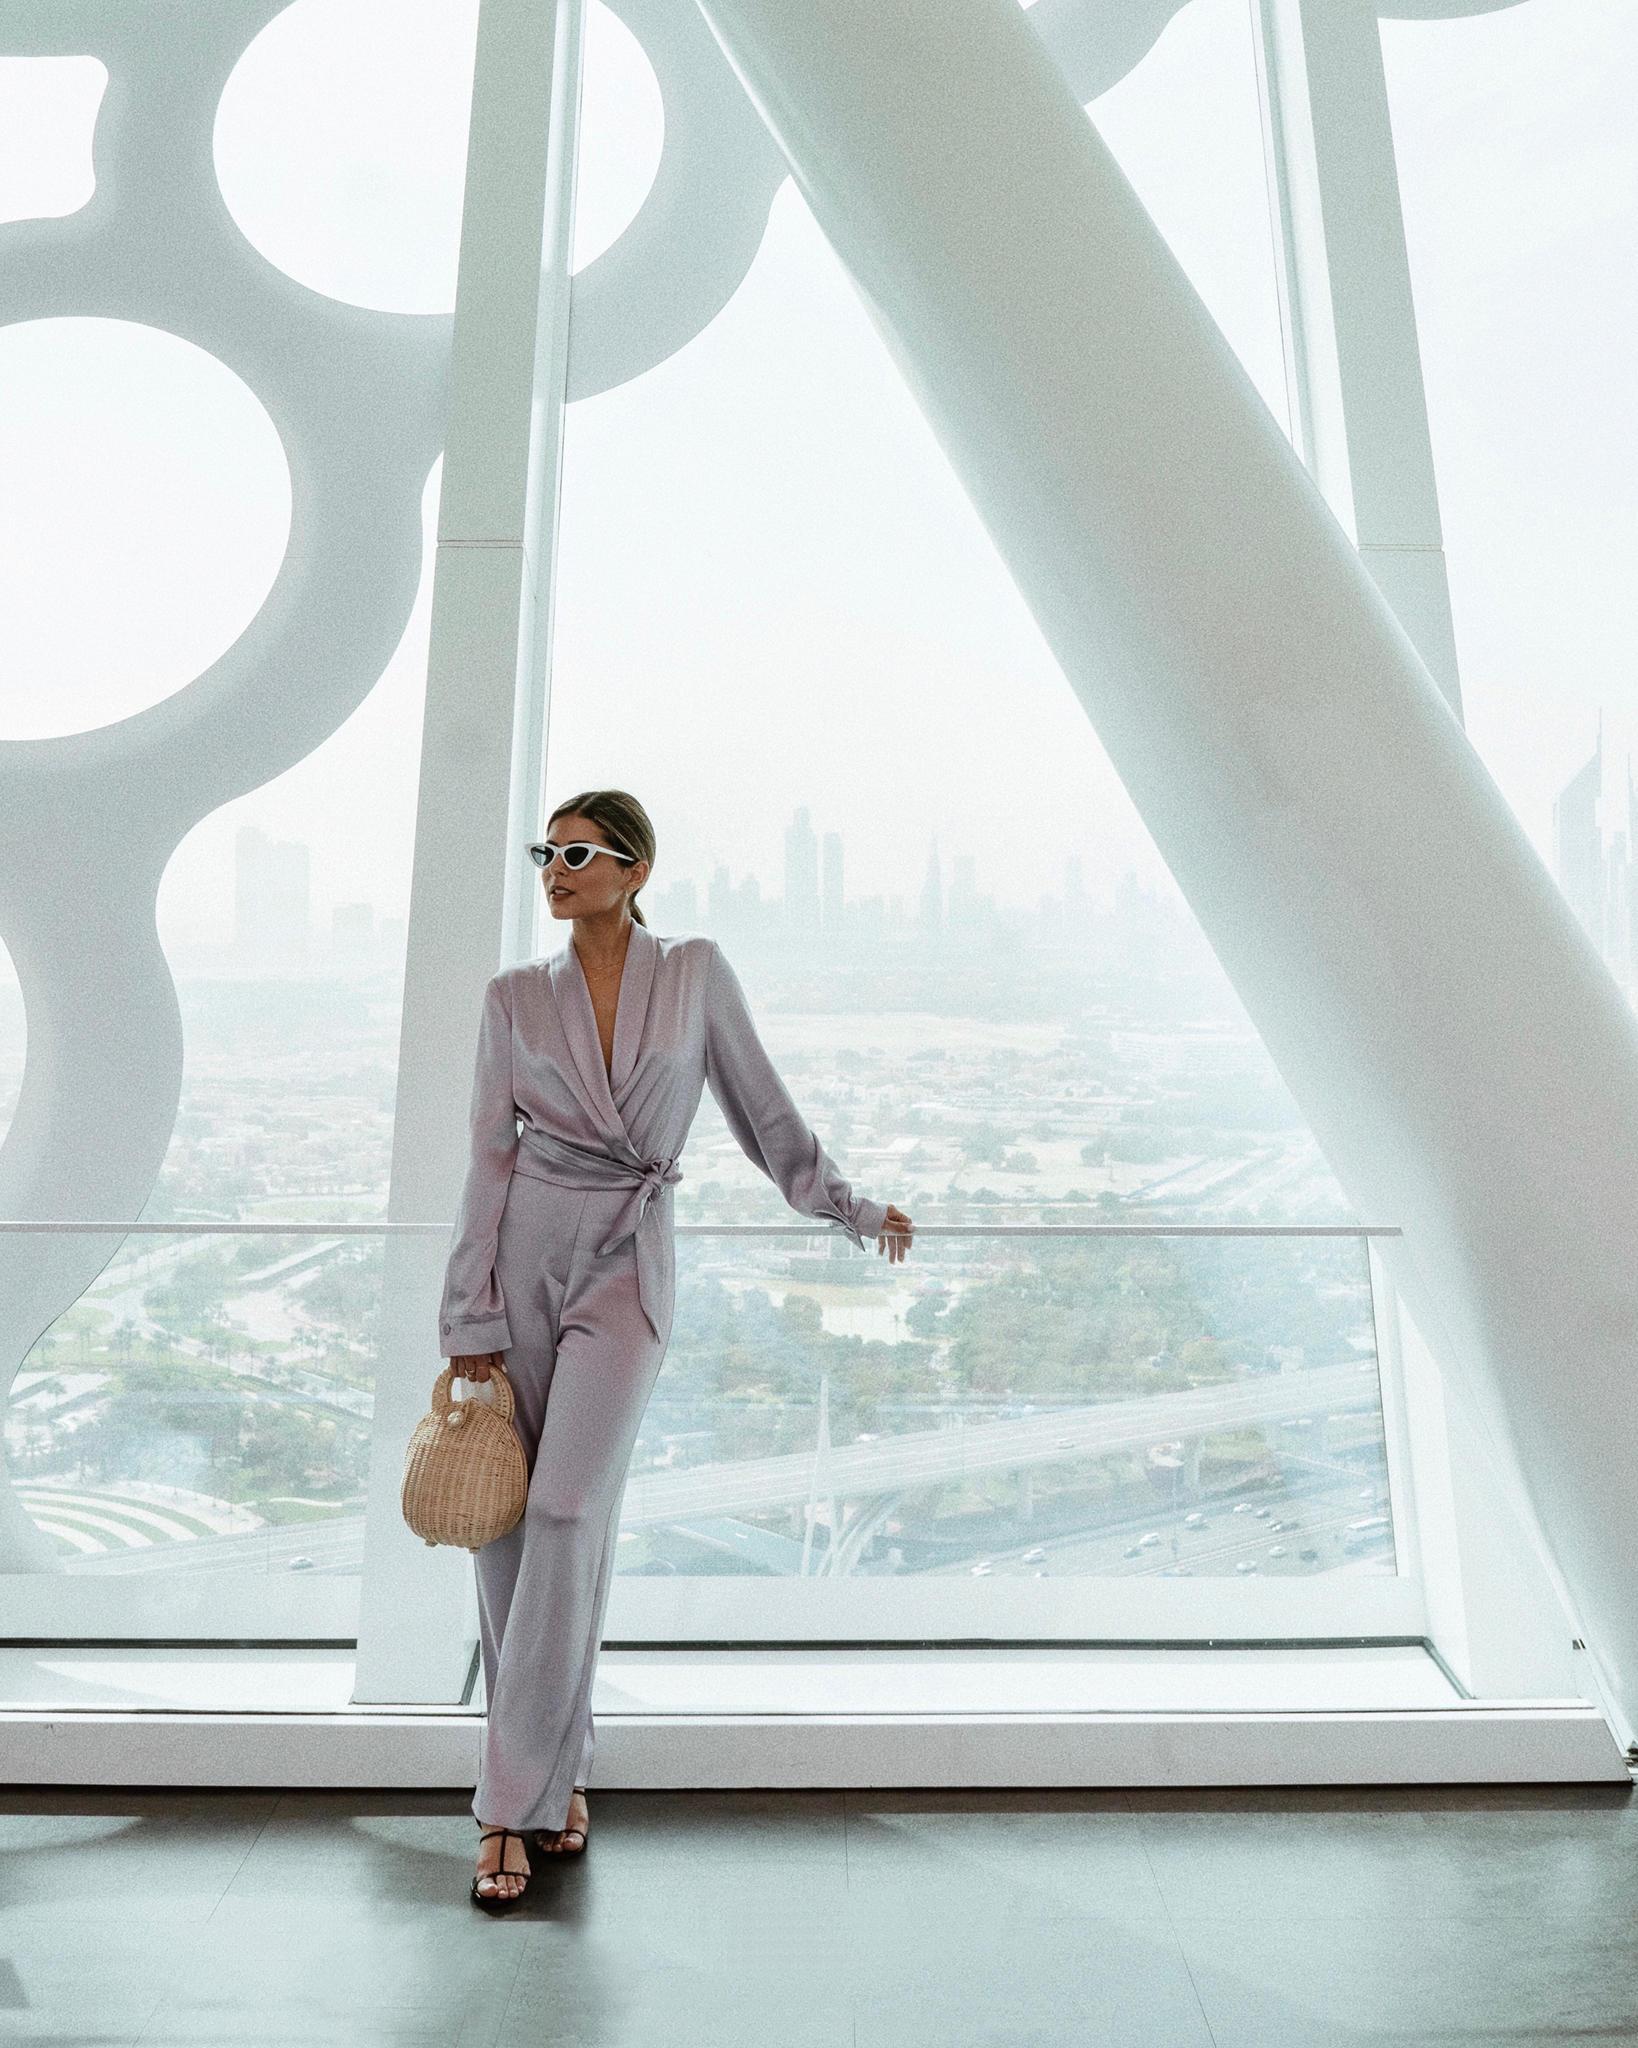 How to Spend 5 days in Dubai by Pam Hetlinger   TheGirlFromPanama.com   Dubai Travel Guide, Instagrammable spots dubai, fashion bloggers in dubai, dubai frame